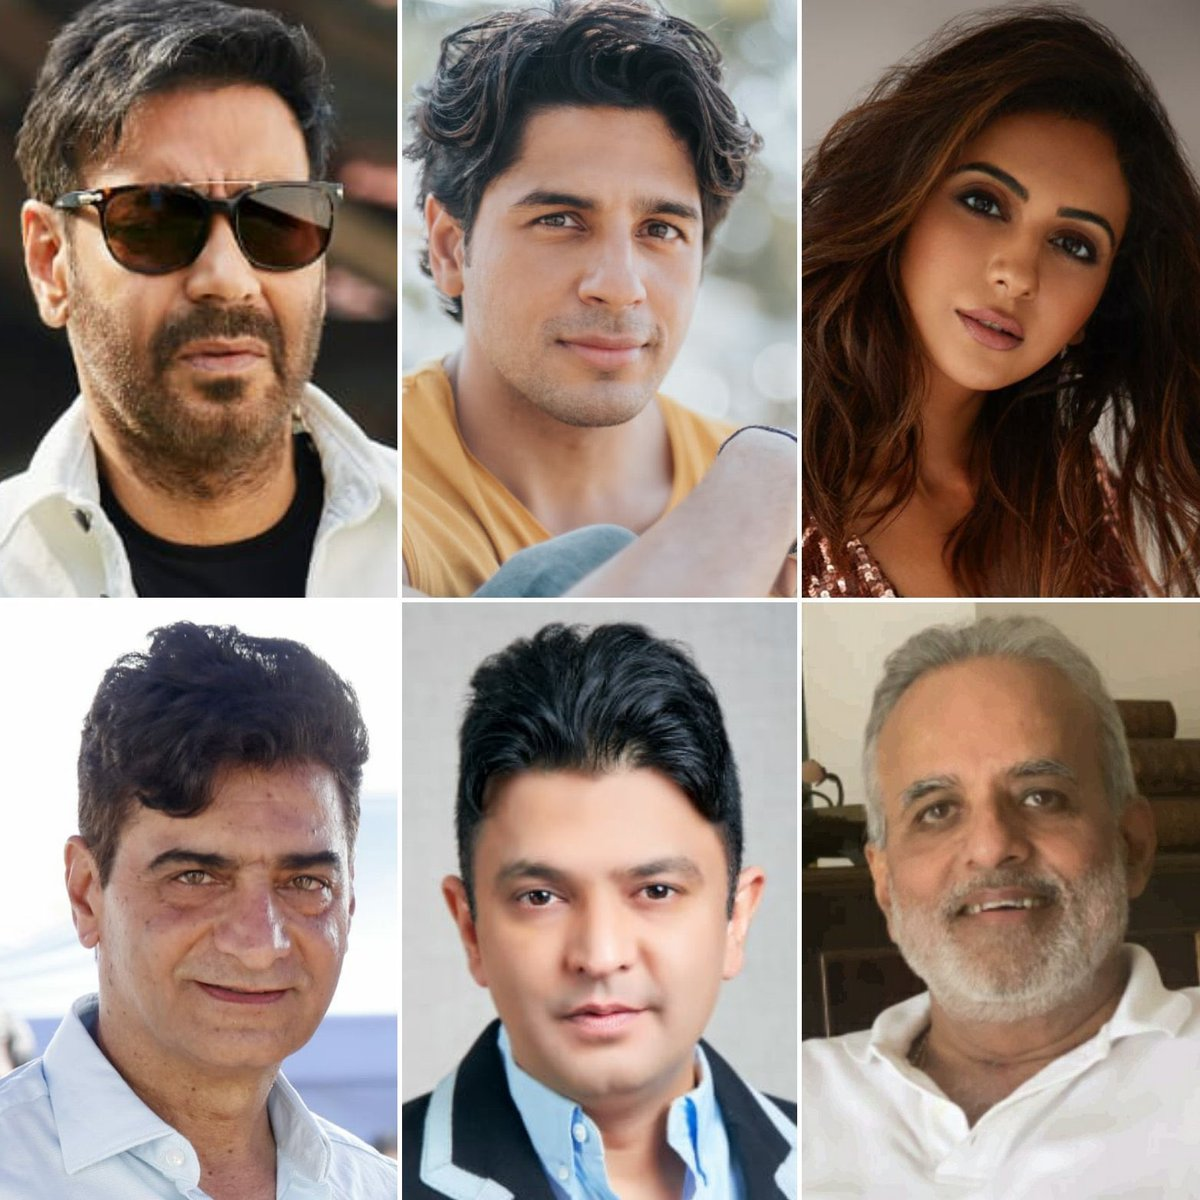 #Announcement: #AjayDevgn, #SidharthMalhotra and @Rakulpreet to star in #ThankGod - a slice of life comedy with a message.  Director: #IndraKumar  Shoot starts 21 Jan 2021.  Producers: @TSeries, #AshokThakeria's #MarutiInternational, @SunirKheterpal, @DeepakMukut & @anandpandit63